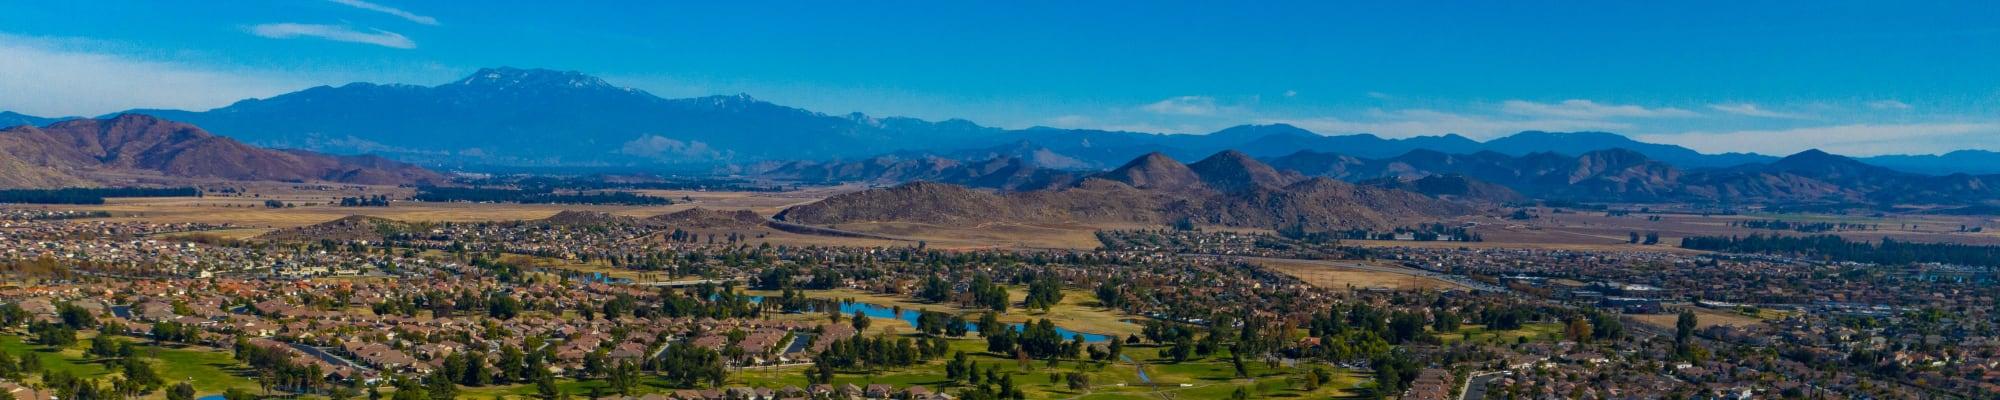 Our philosophy at WellQuest of Menifee Lakes in Menifee, California